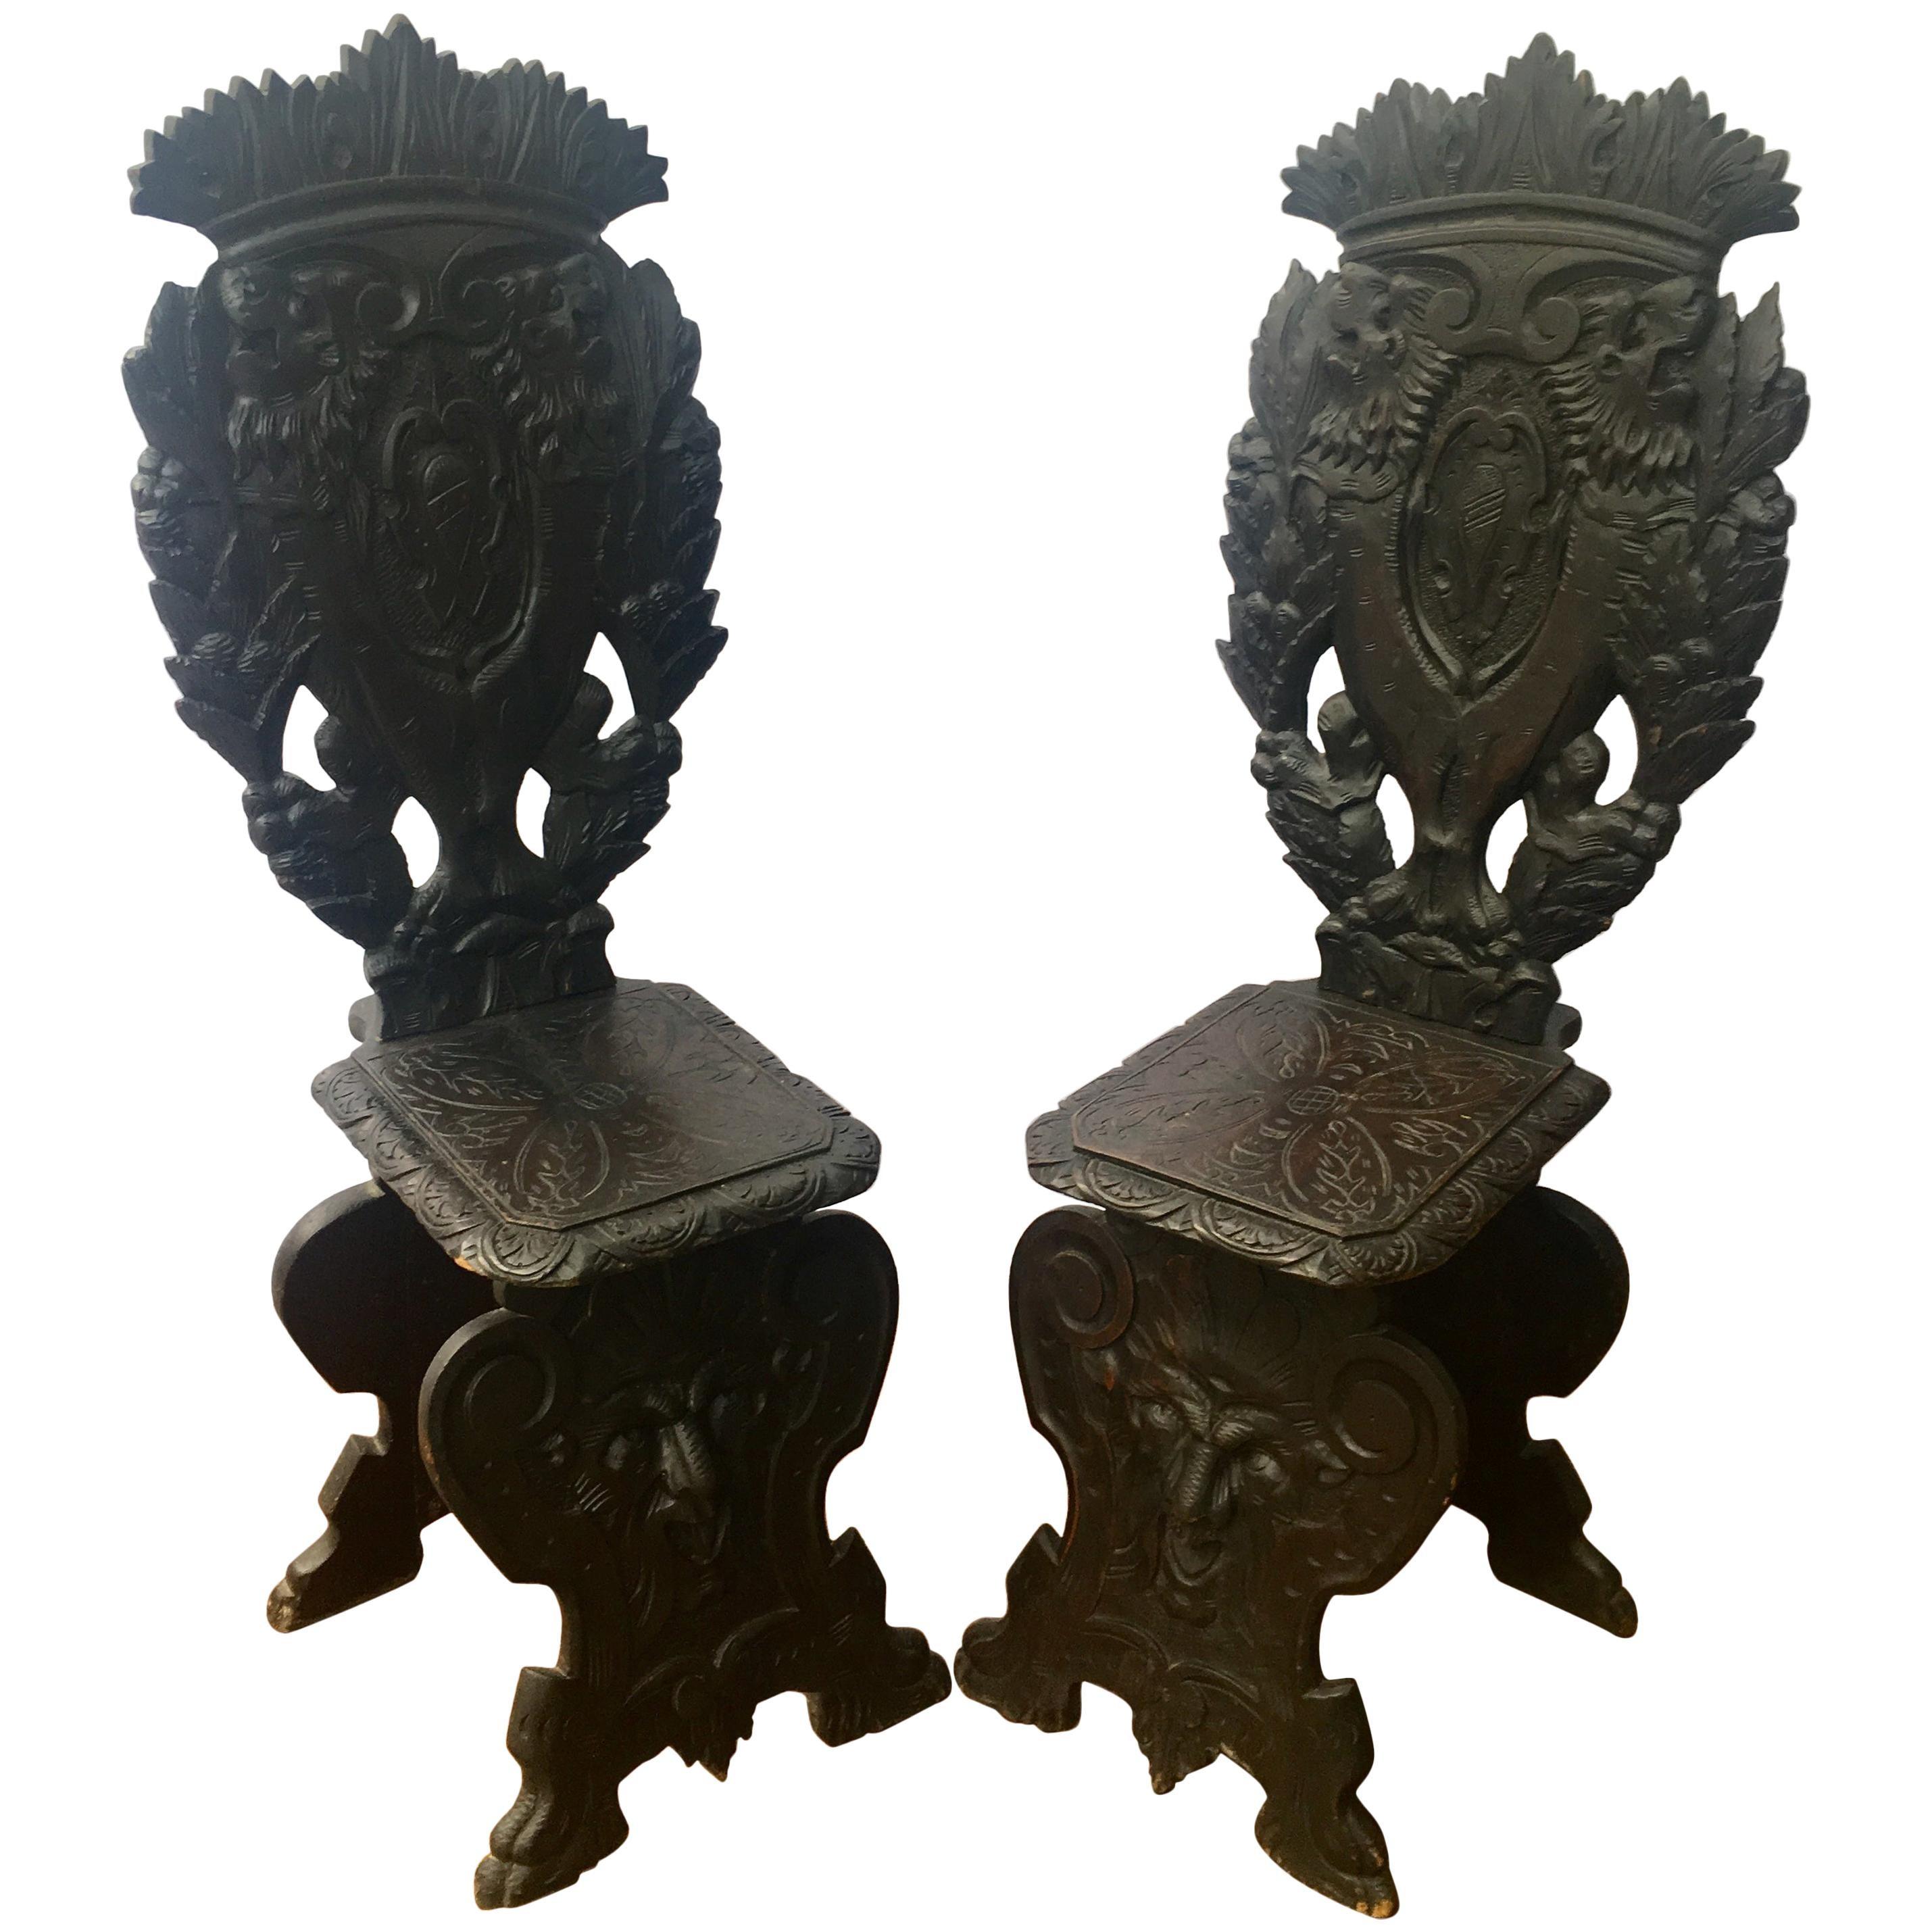 Pair of Italian Renaissance Revival Sgabello Chairs, circa 1870